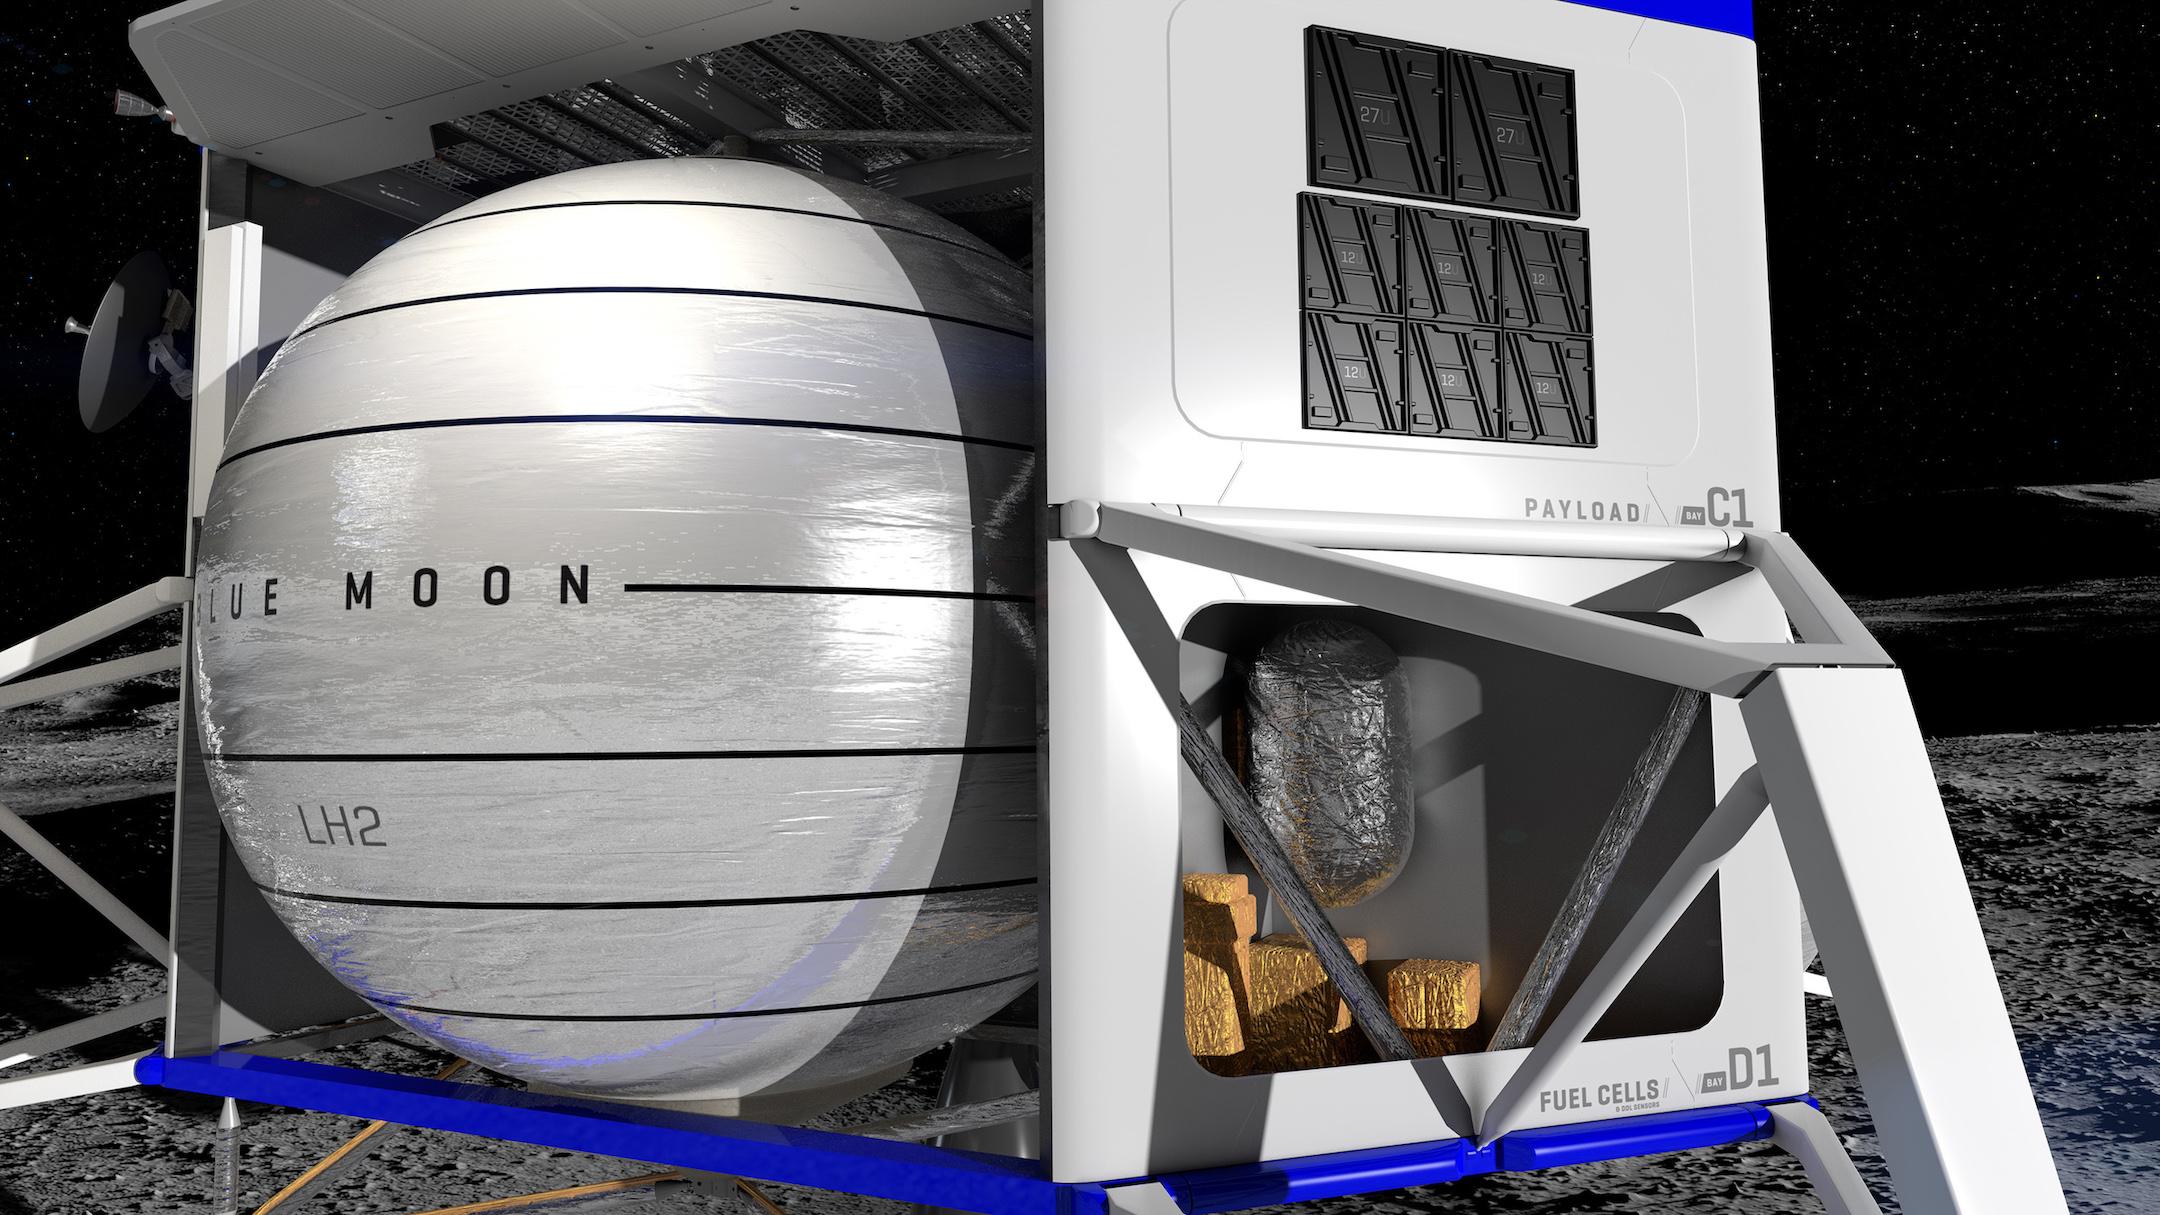 de32a4275 Elon Musk Jabs Jeff Bezos Over Blue Origin's Moon Lander | Space